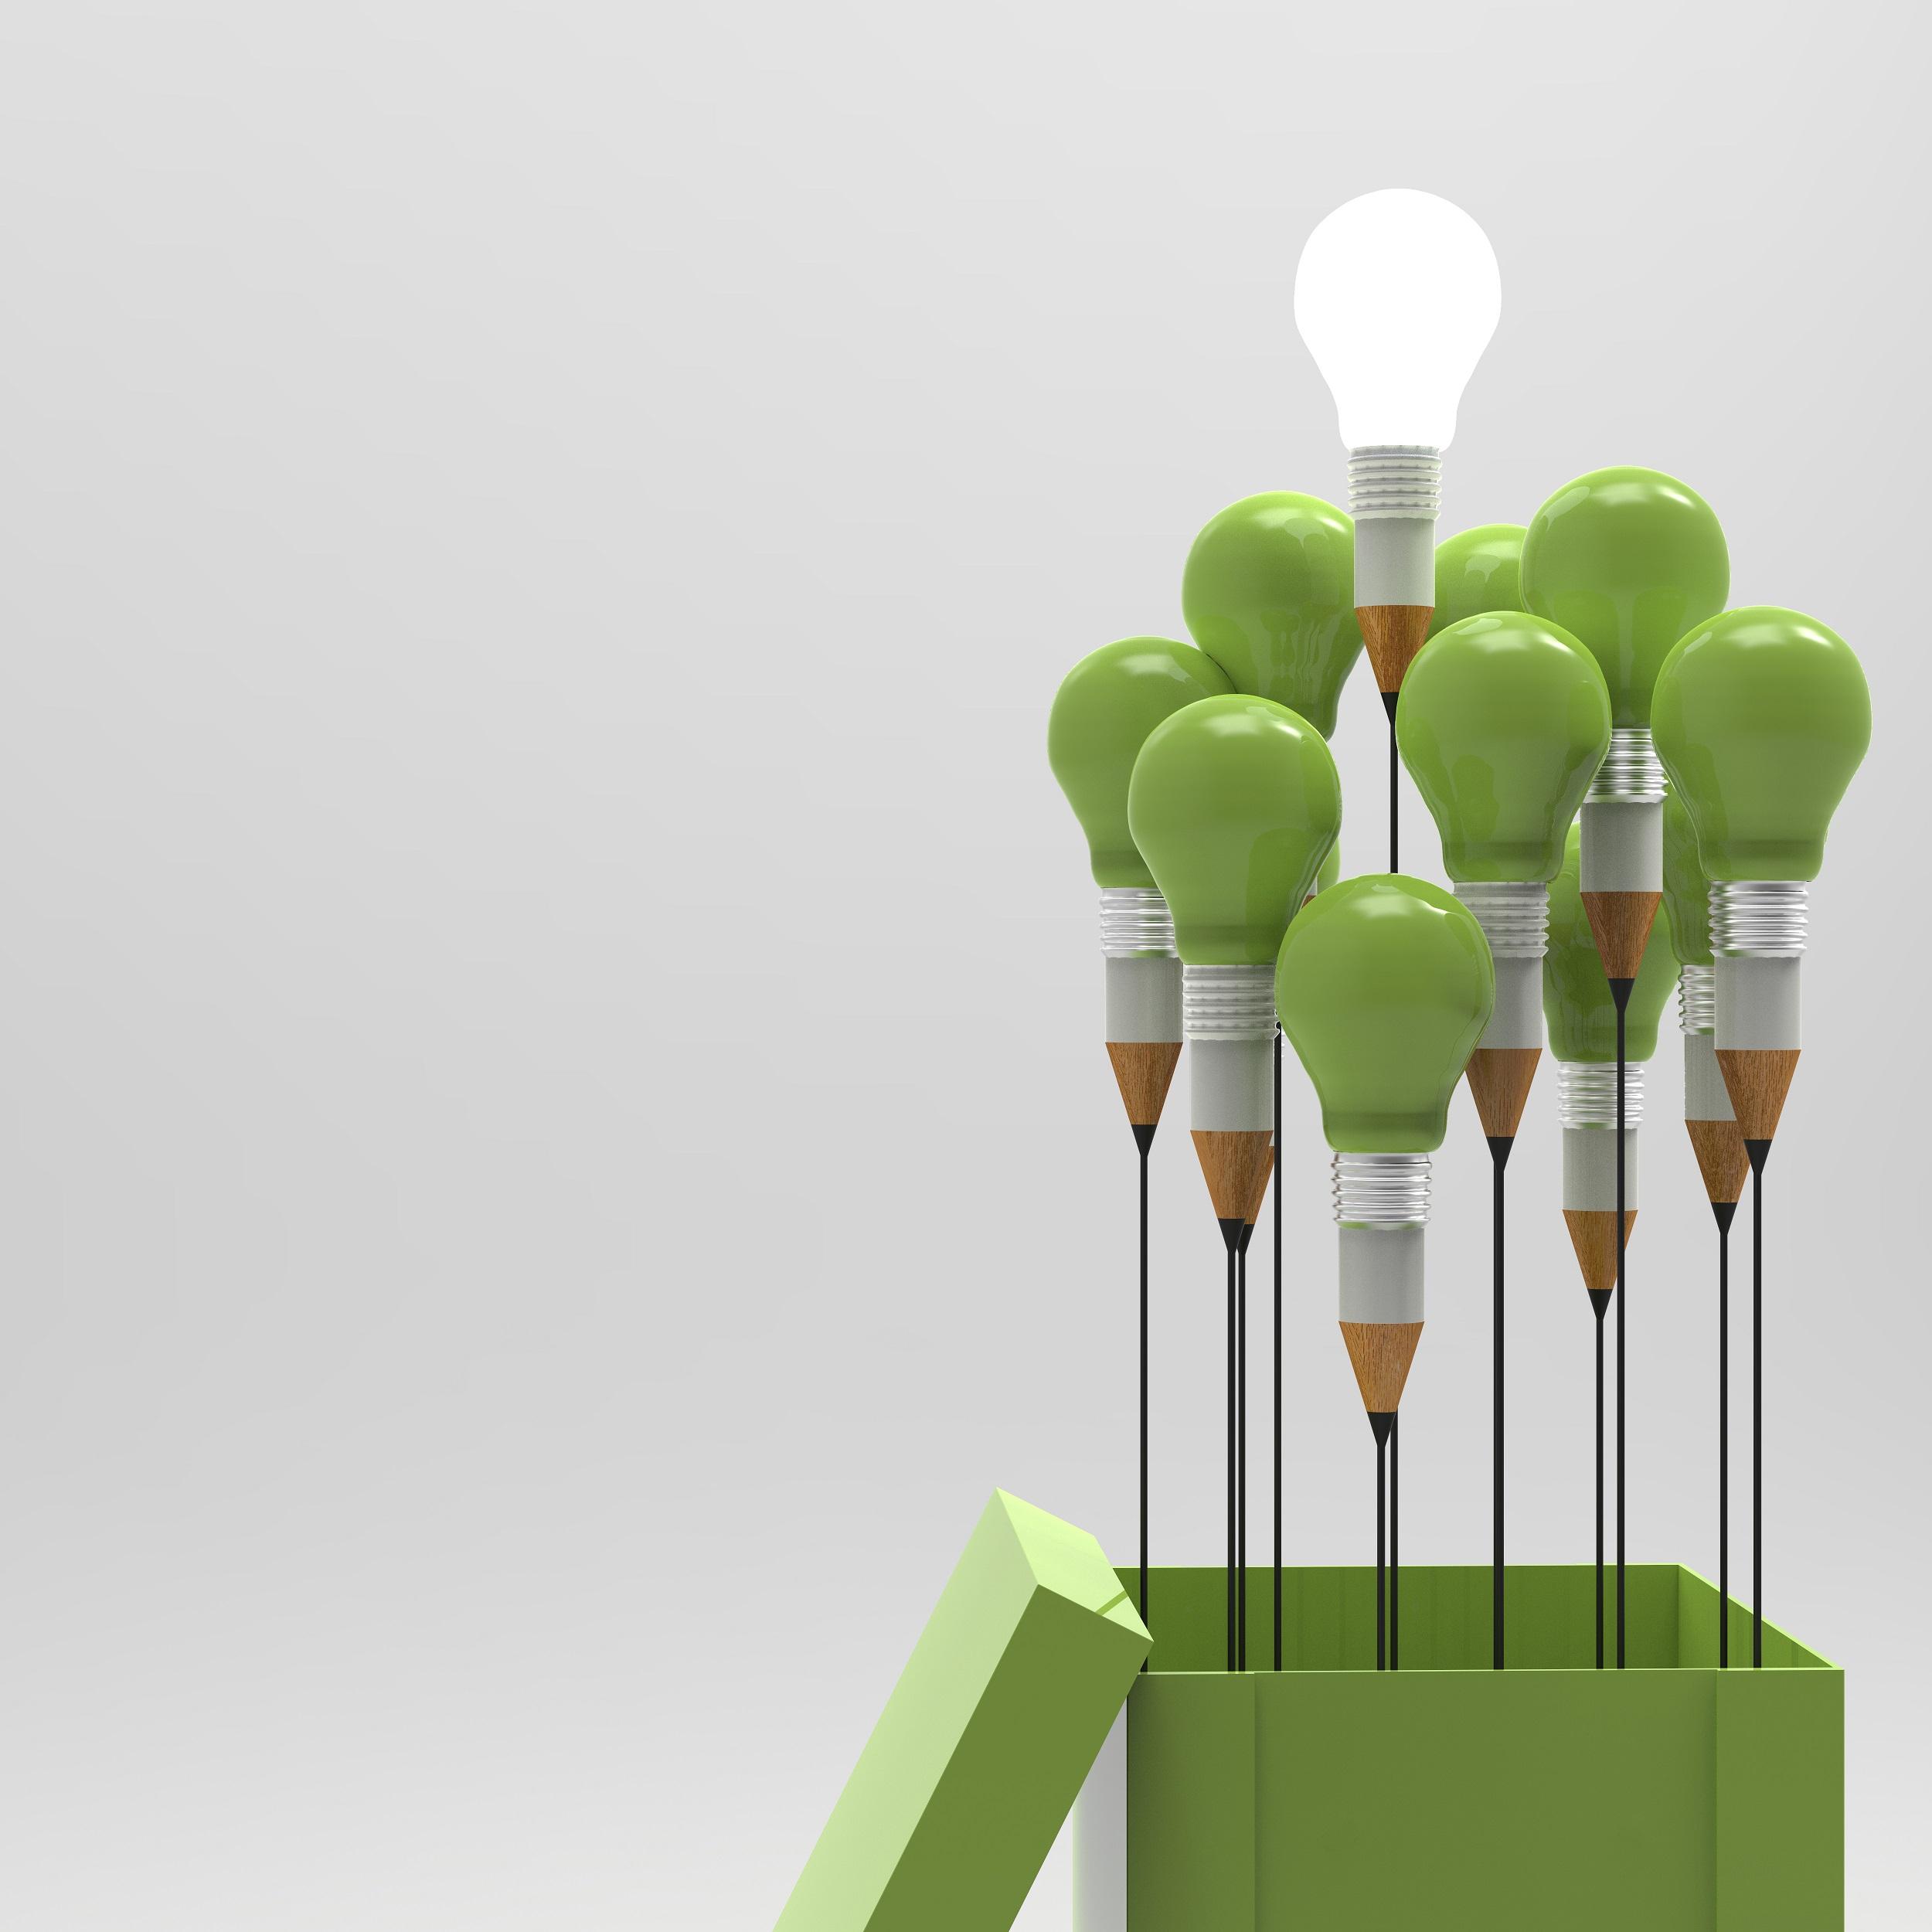 How to Make Your Envi Heater More Eco